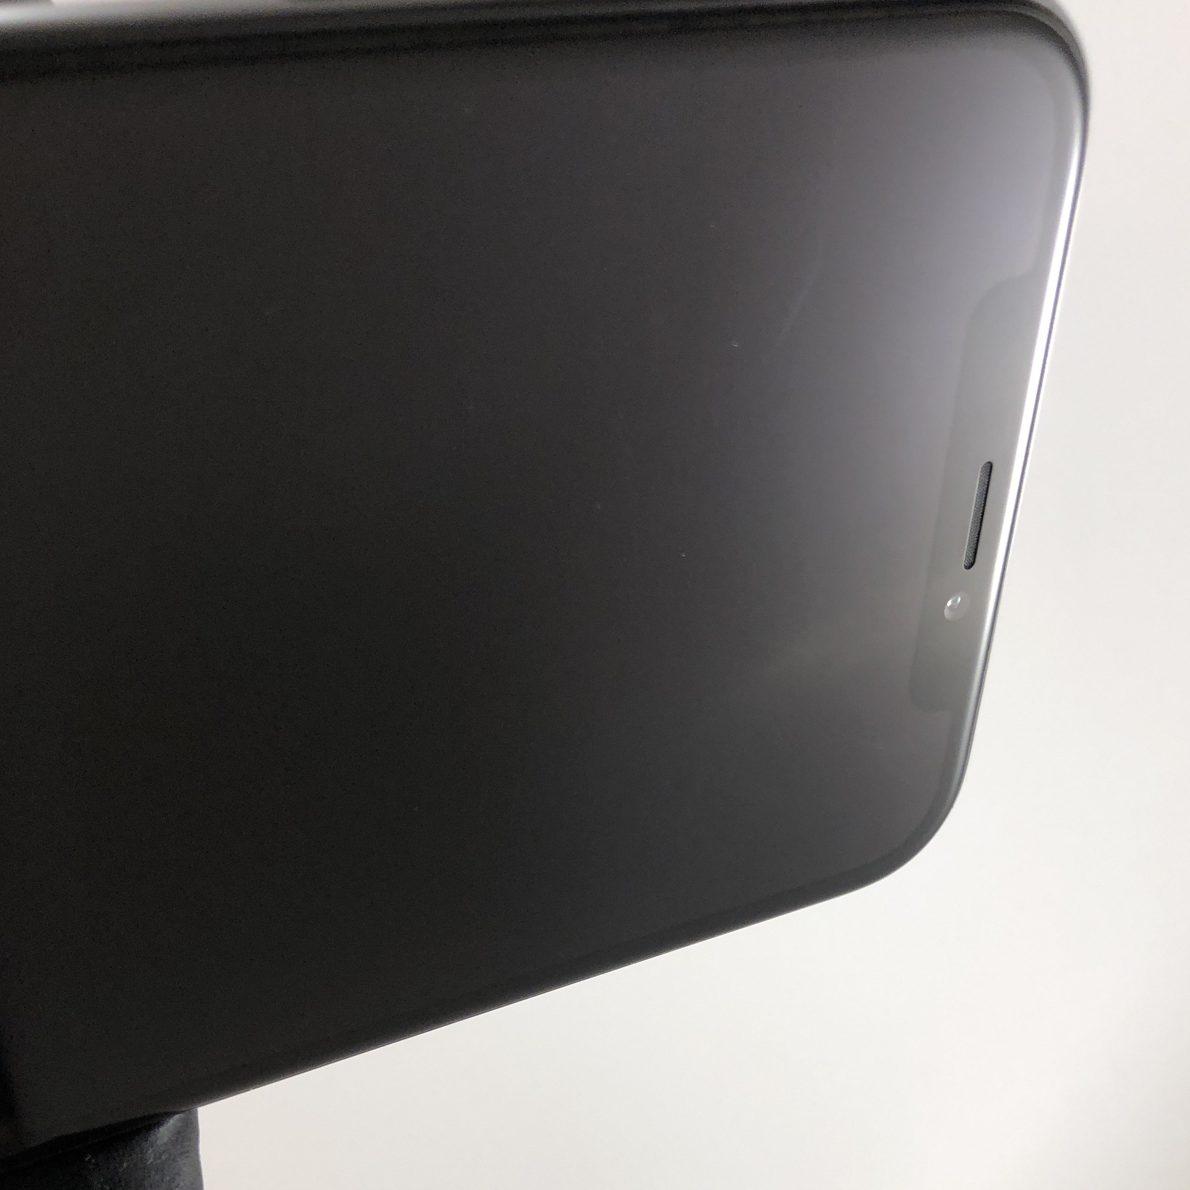 iPhone X 64GB, 64GB, Space Gray, image 4